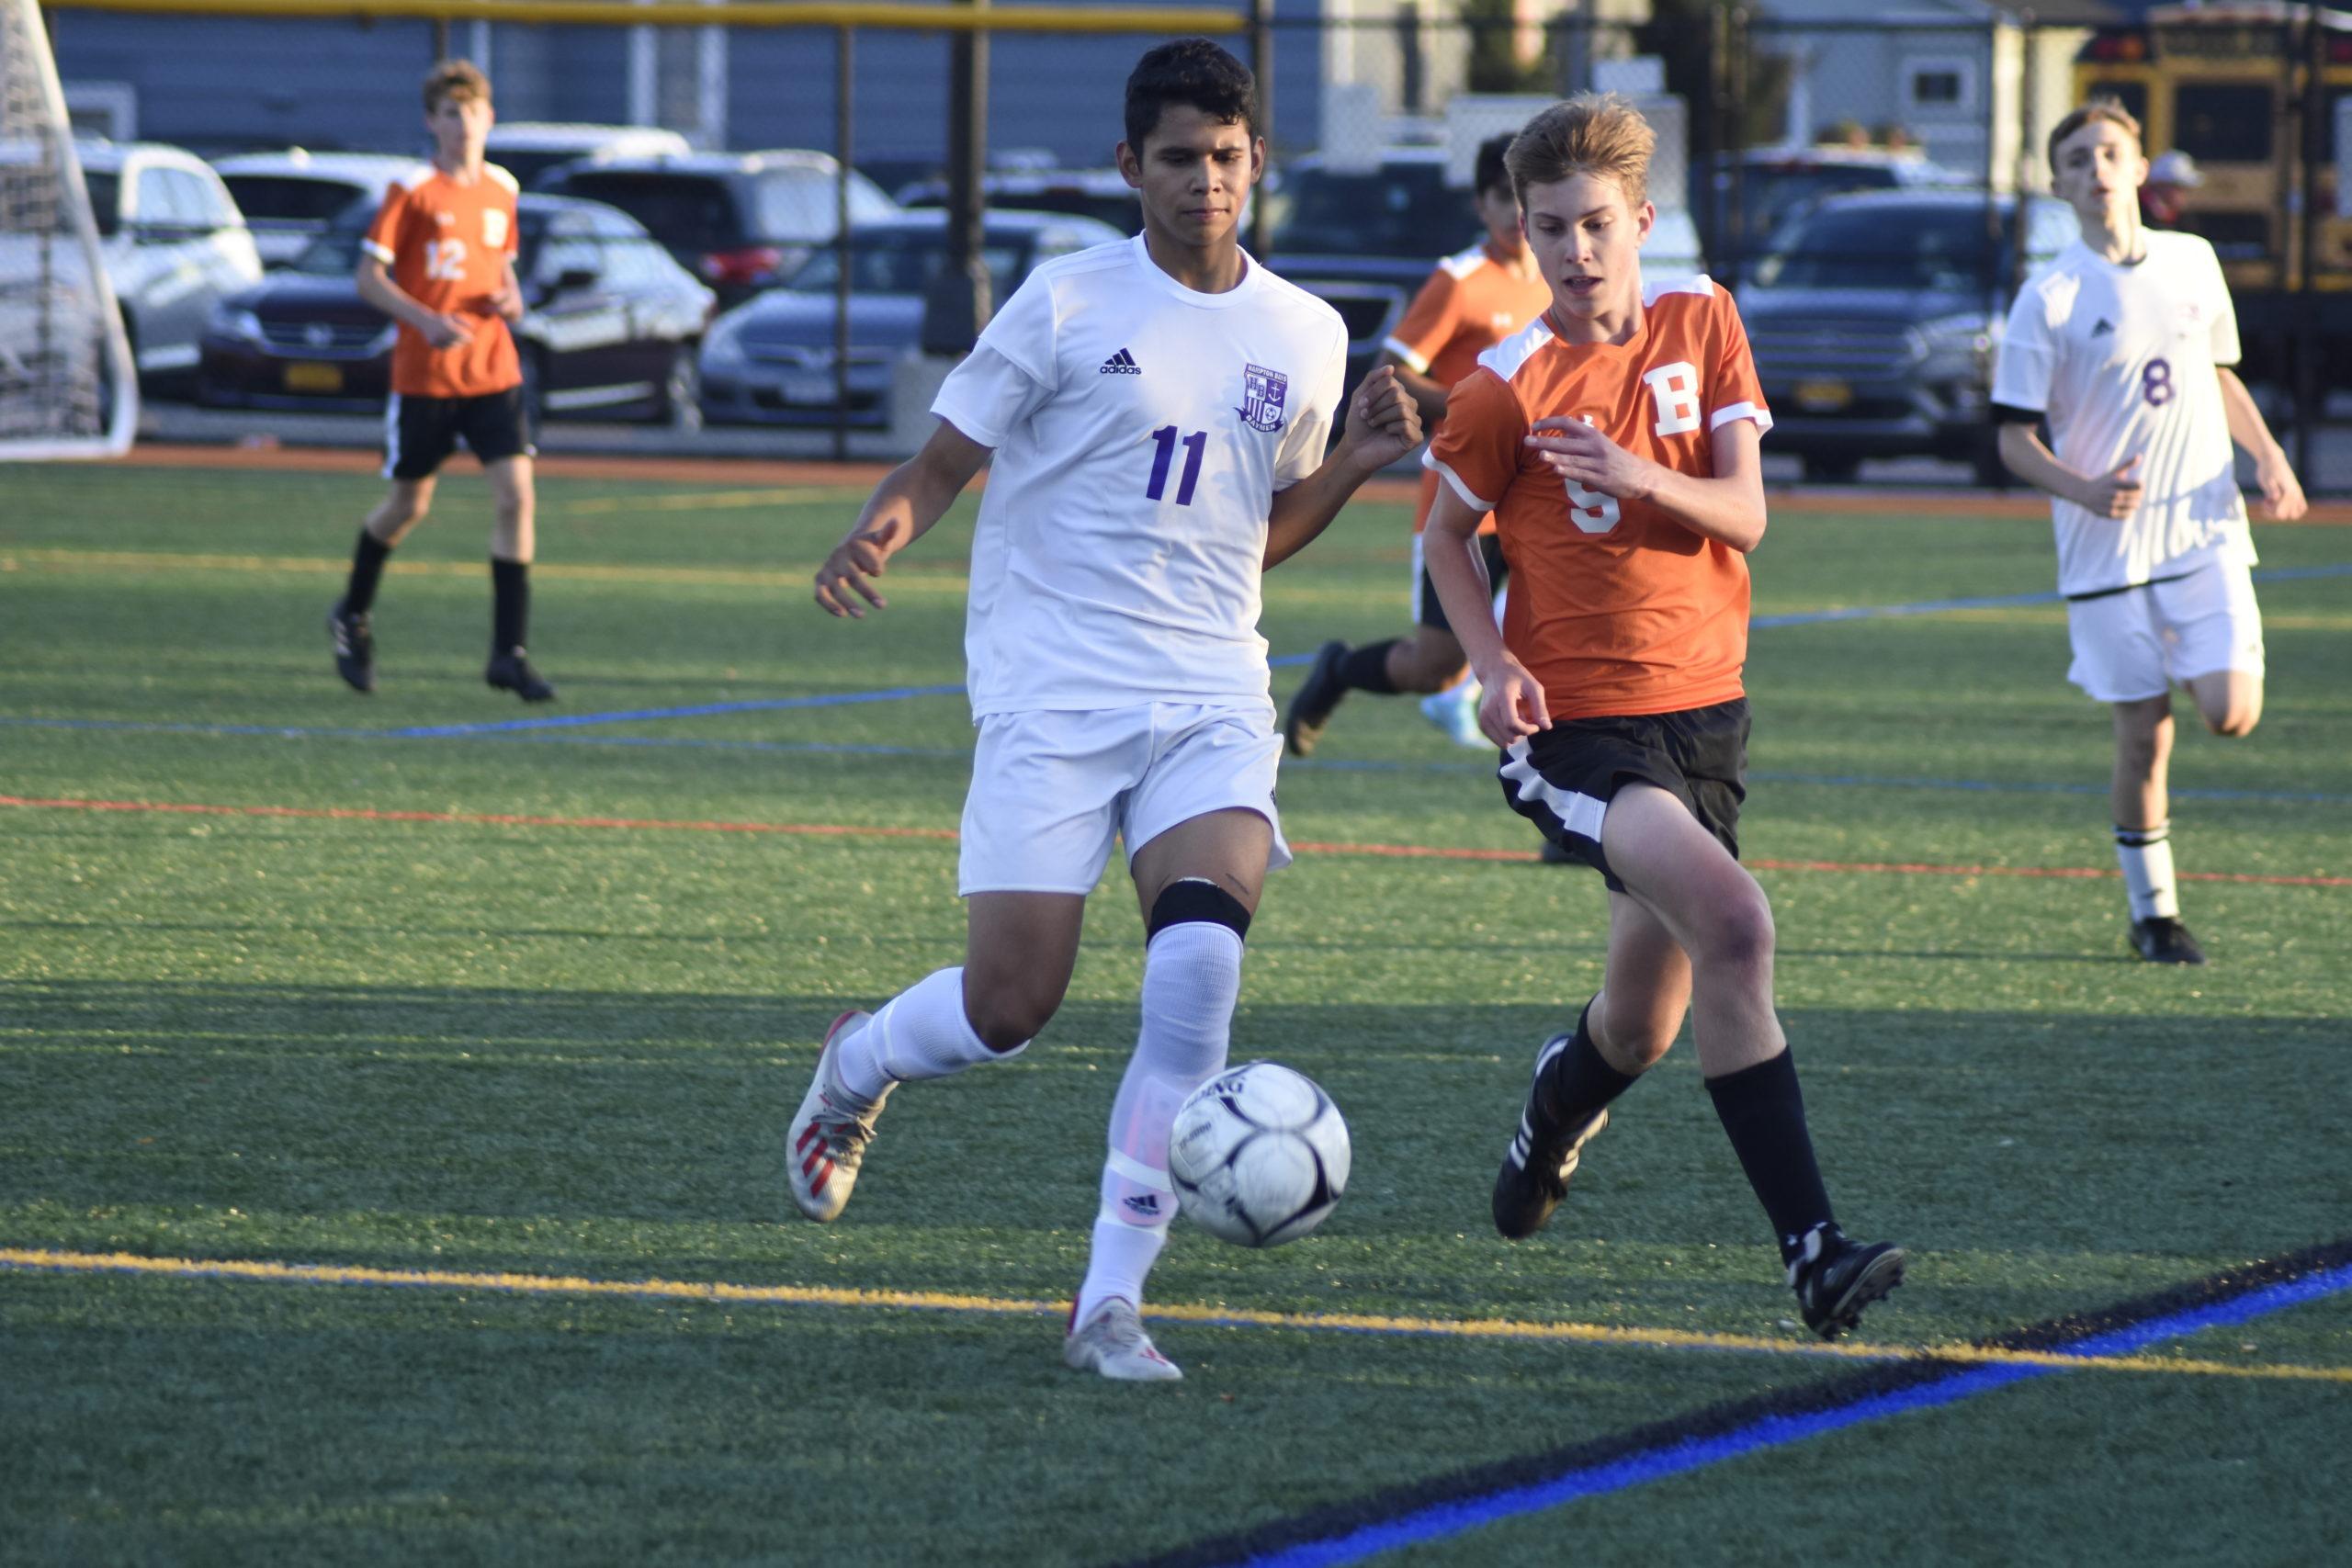 Darwin Fernandez is one of many key returning starters for the Hampton Bays boys soccer team this season.